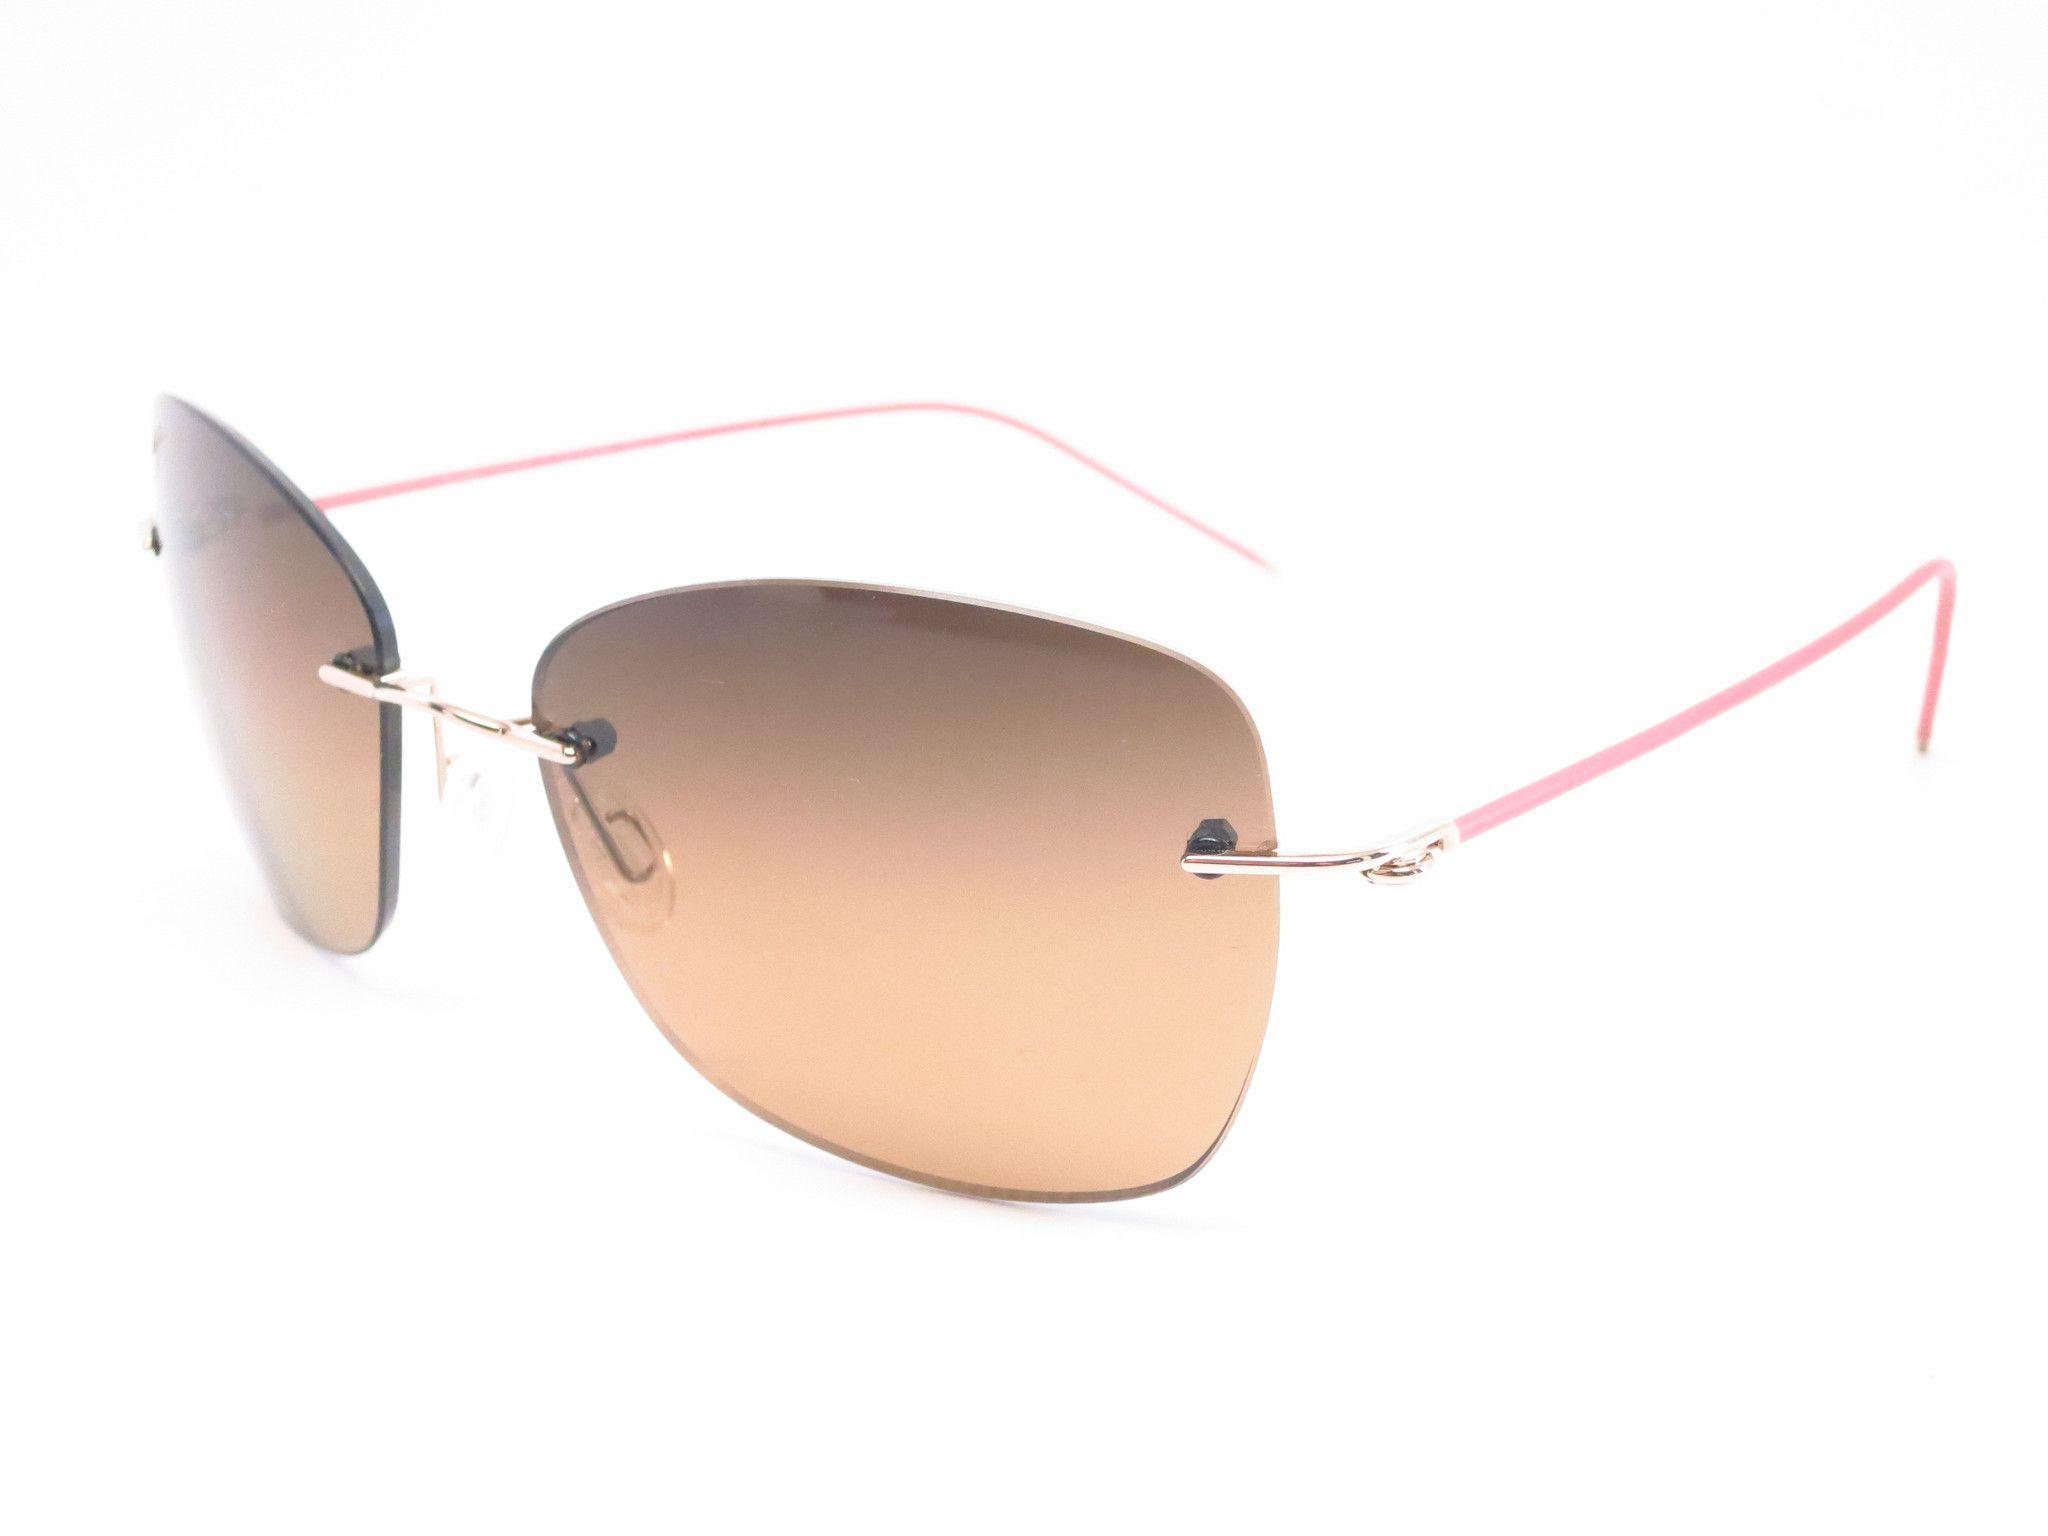 02ce131686e Description of Maui Jim Apapane Maui Jim Apapane sunglasses was inspired by  one of the most